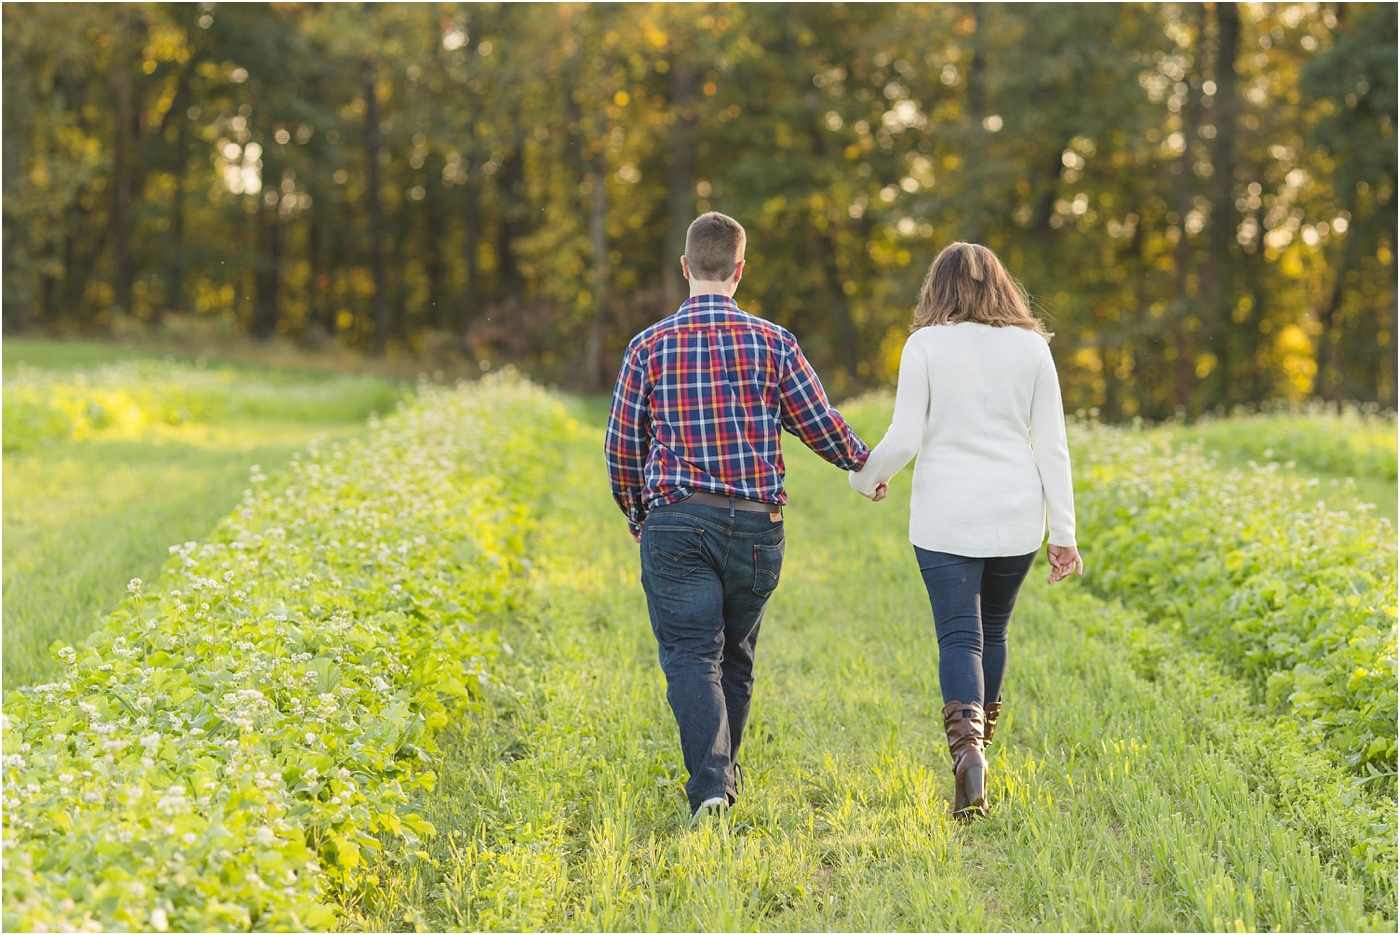 Larriland-Farm-Engagement-Photo_0013.jpg